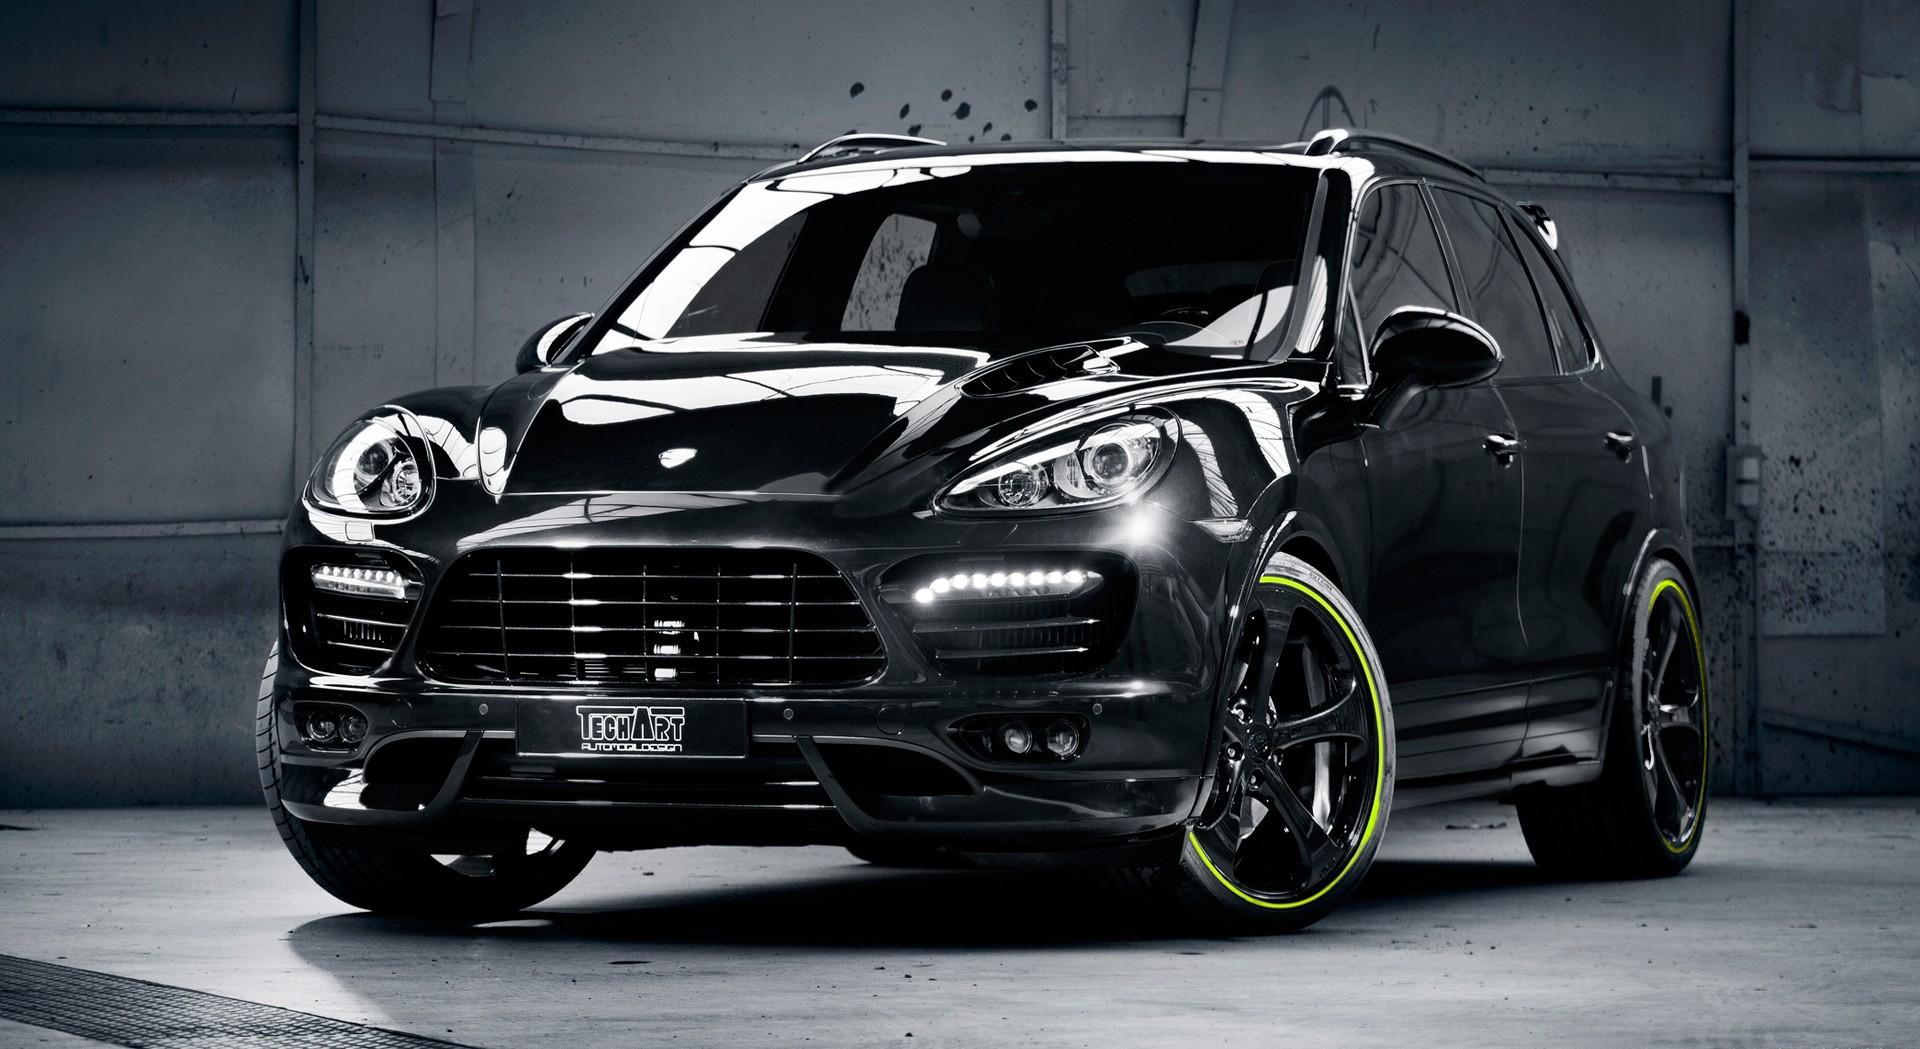 Hd Wallpaper Of Cool Cars Porsche Cayenne S Black Hd Desktop Wallpapers 4k Hd